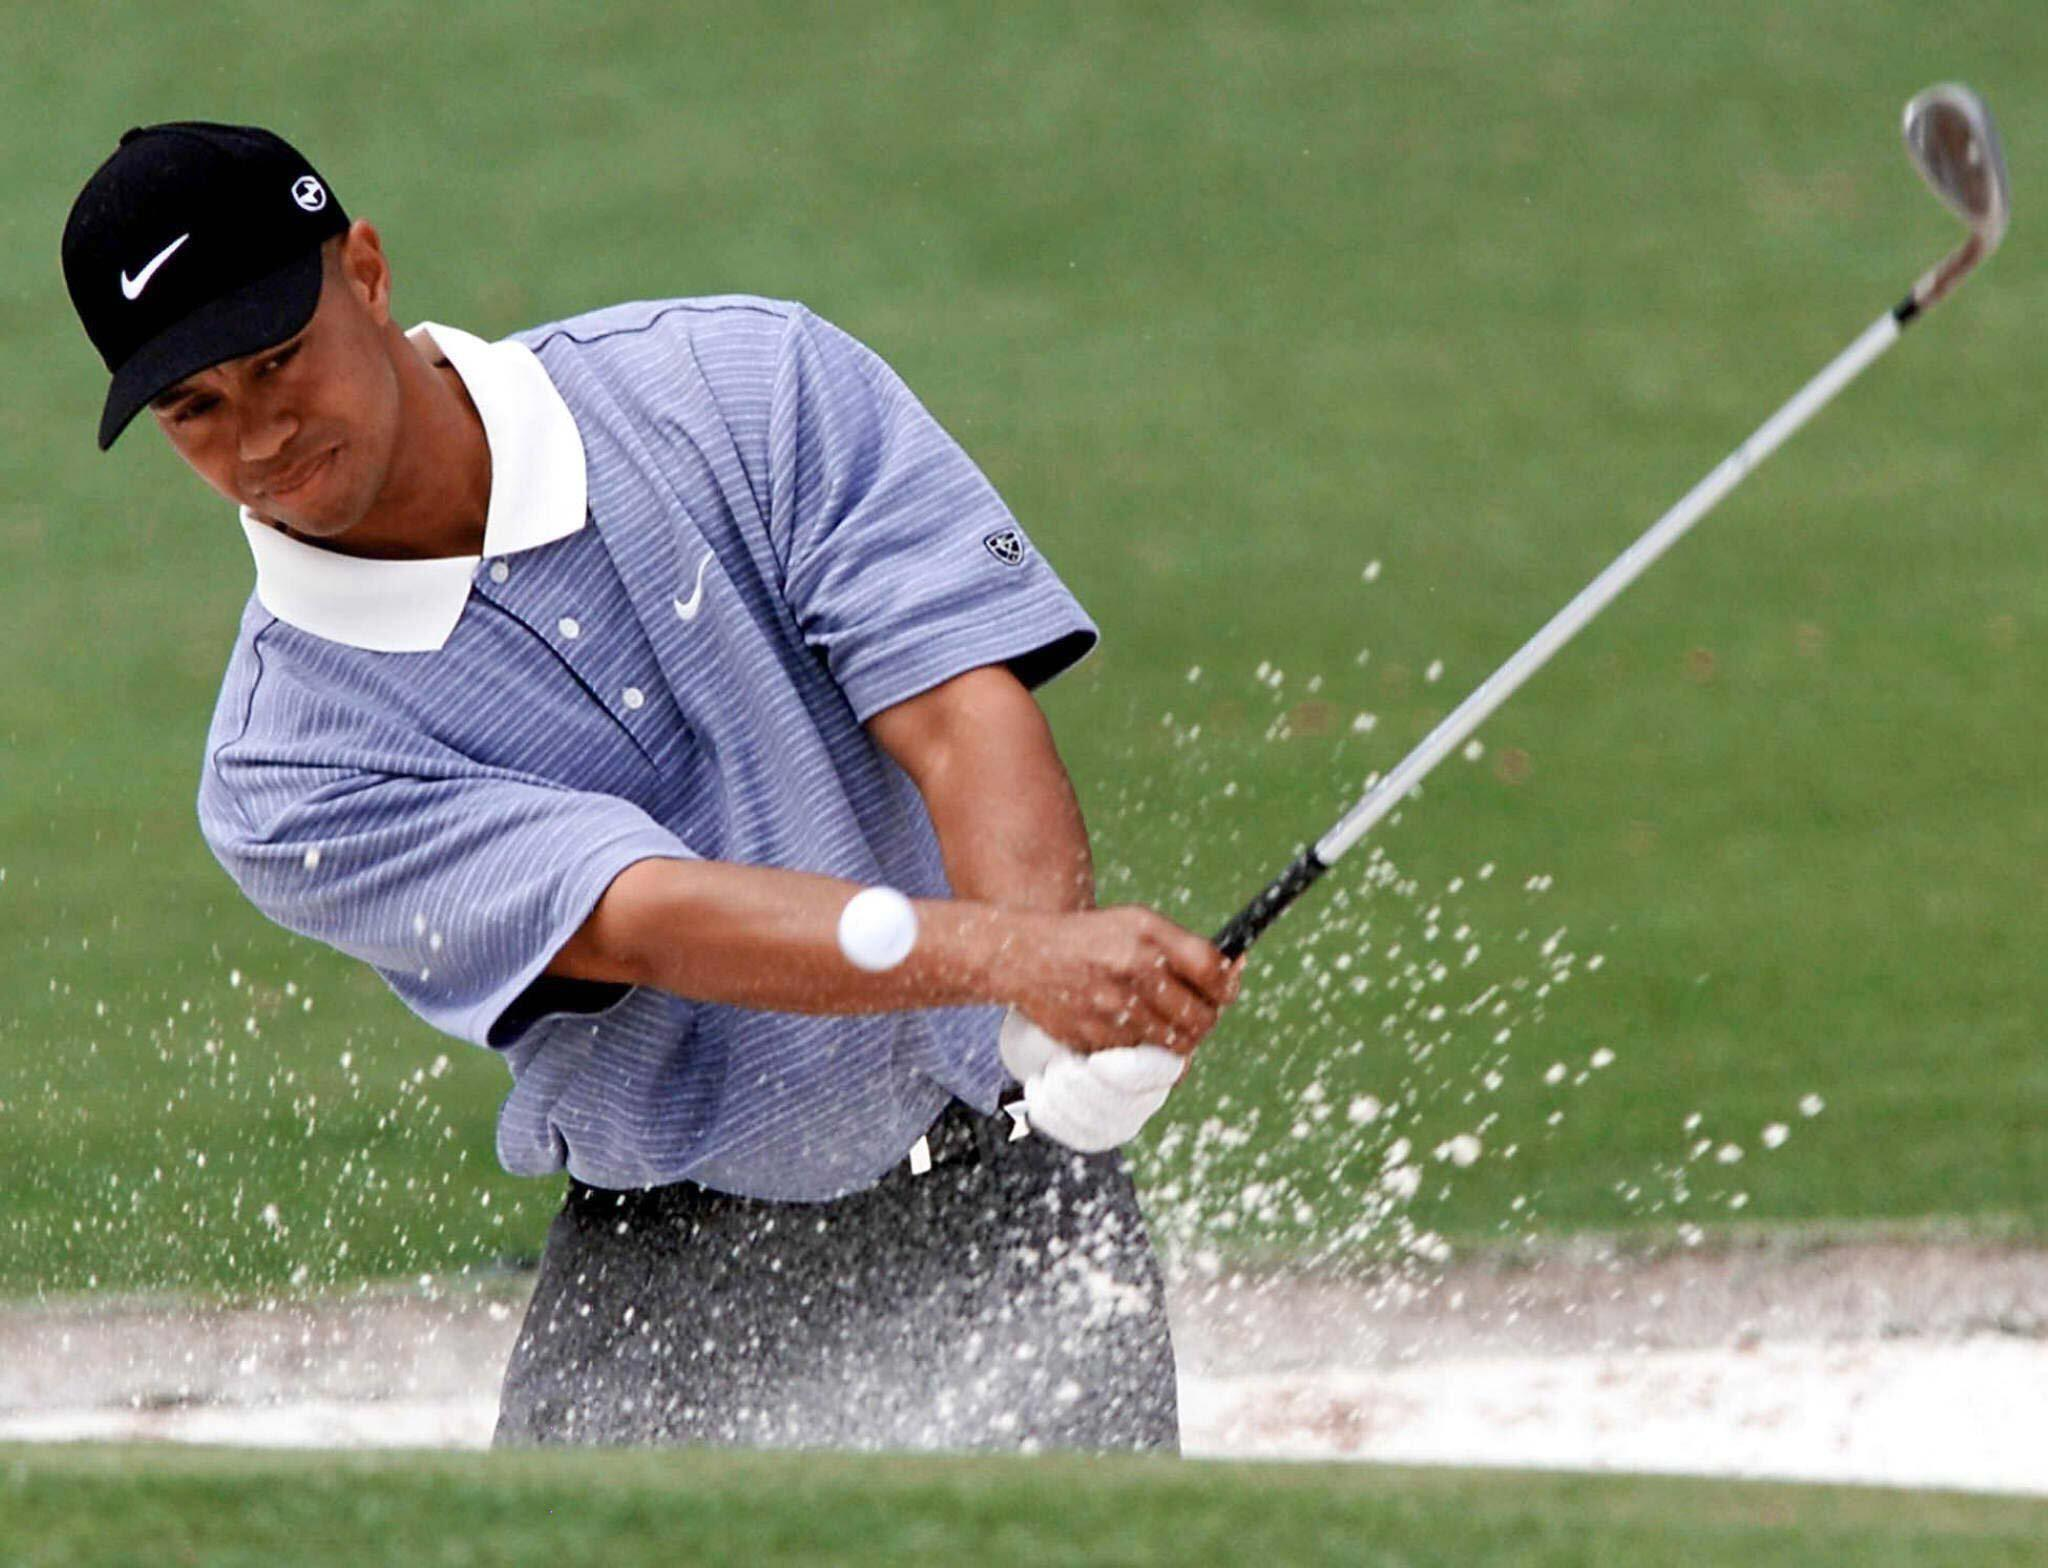 Bild zu Tiger Woods, 2001, US Masters, Masters, Augusta, Bunker, Training